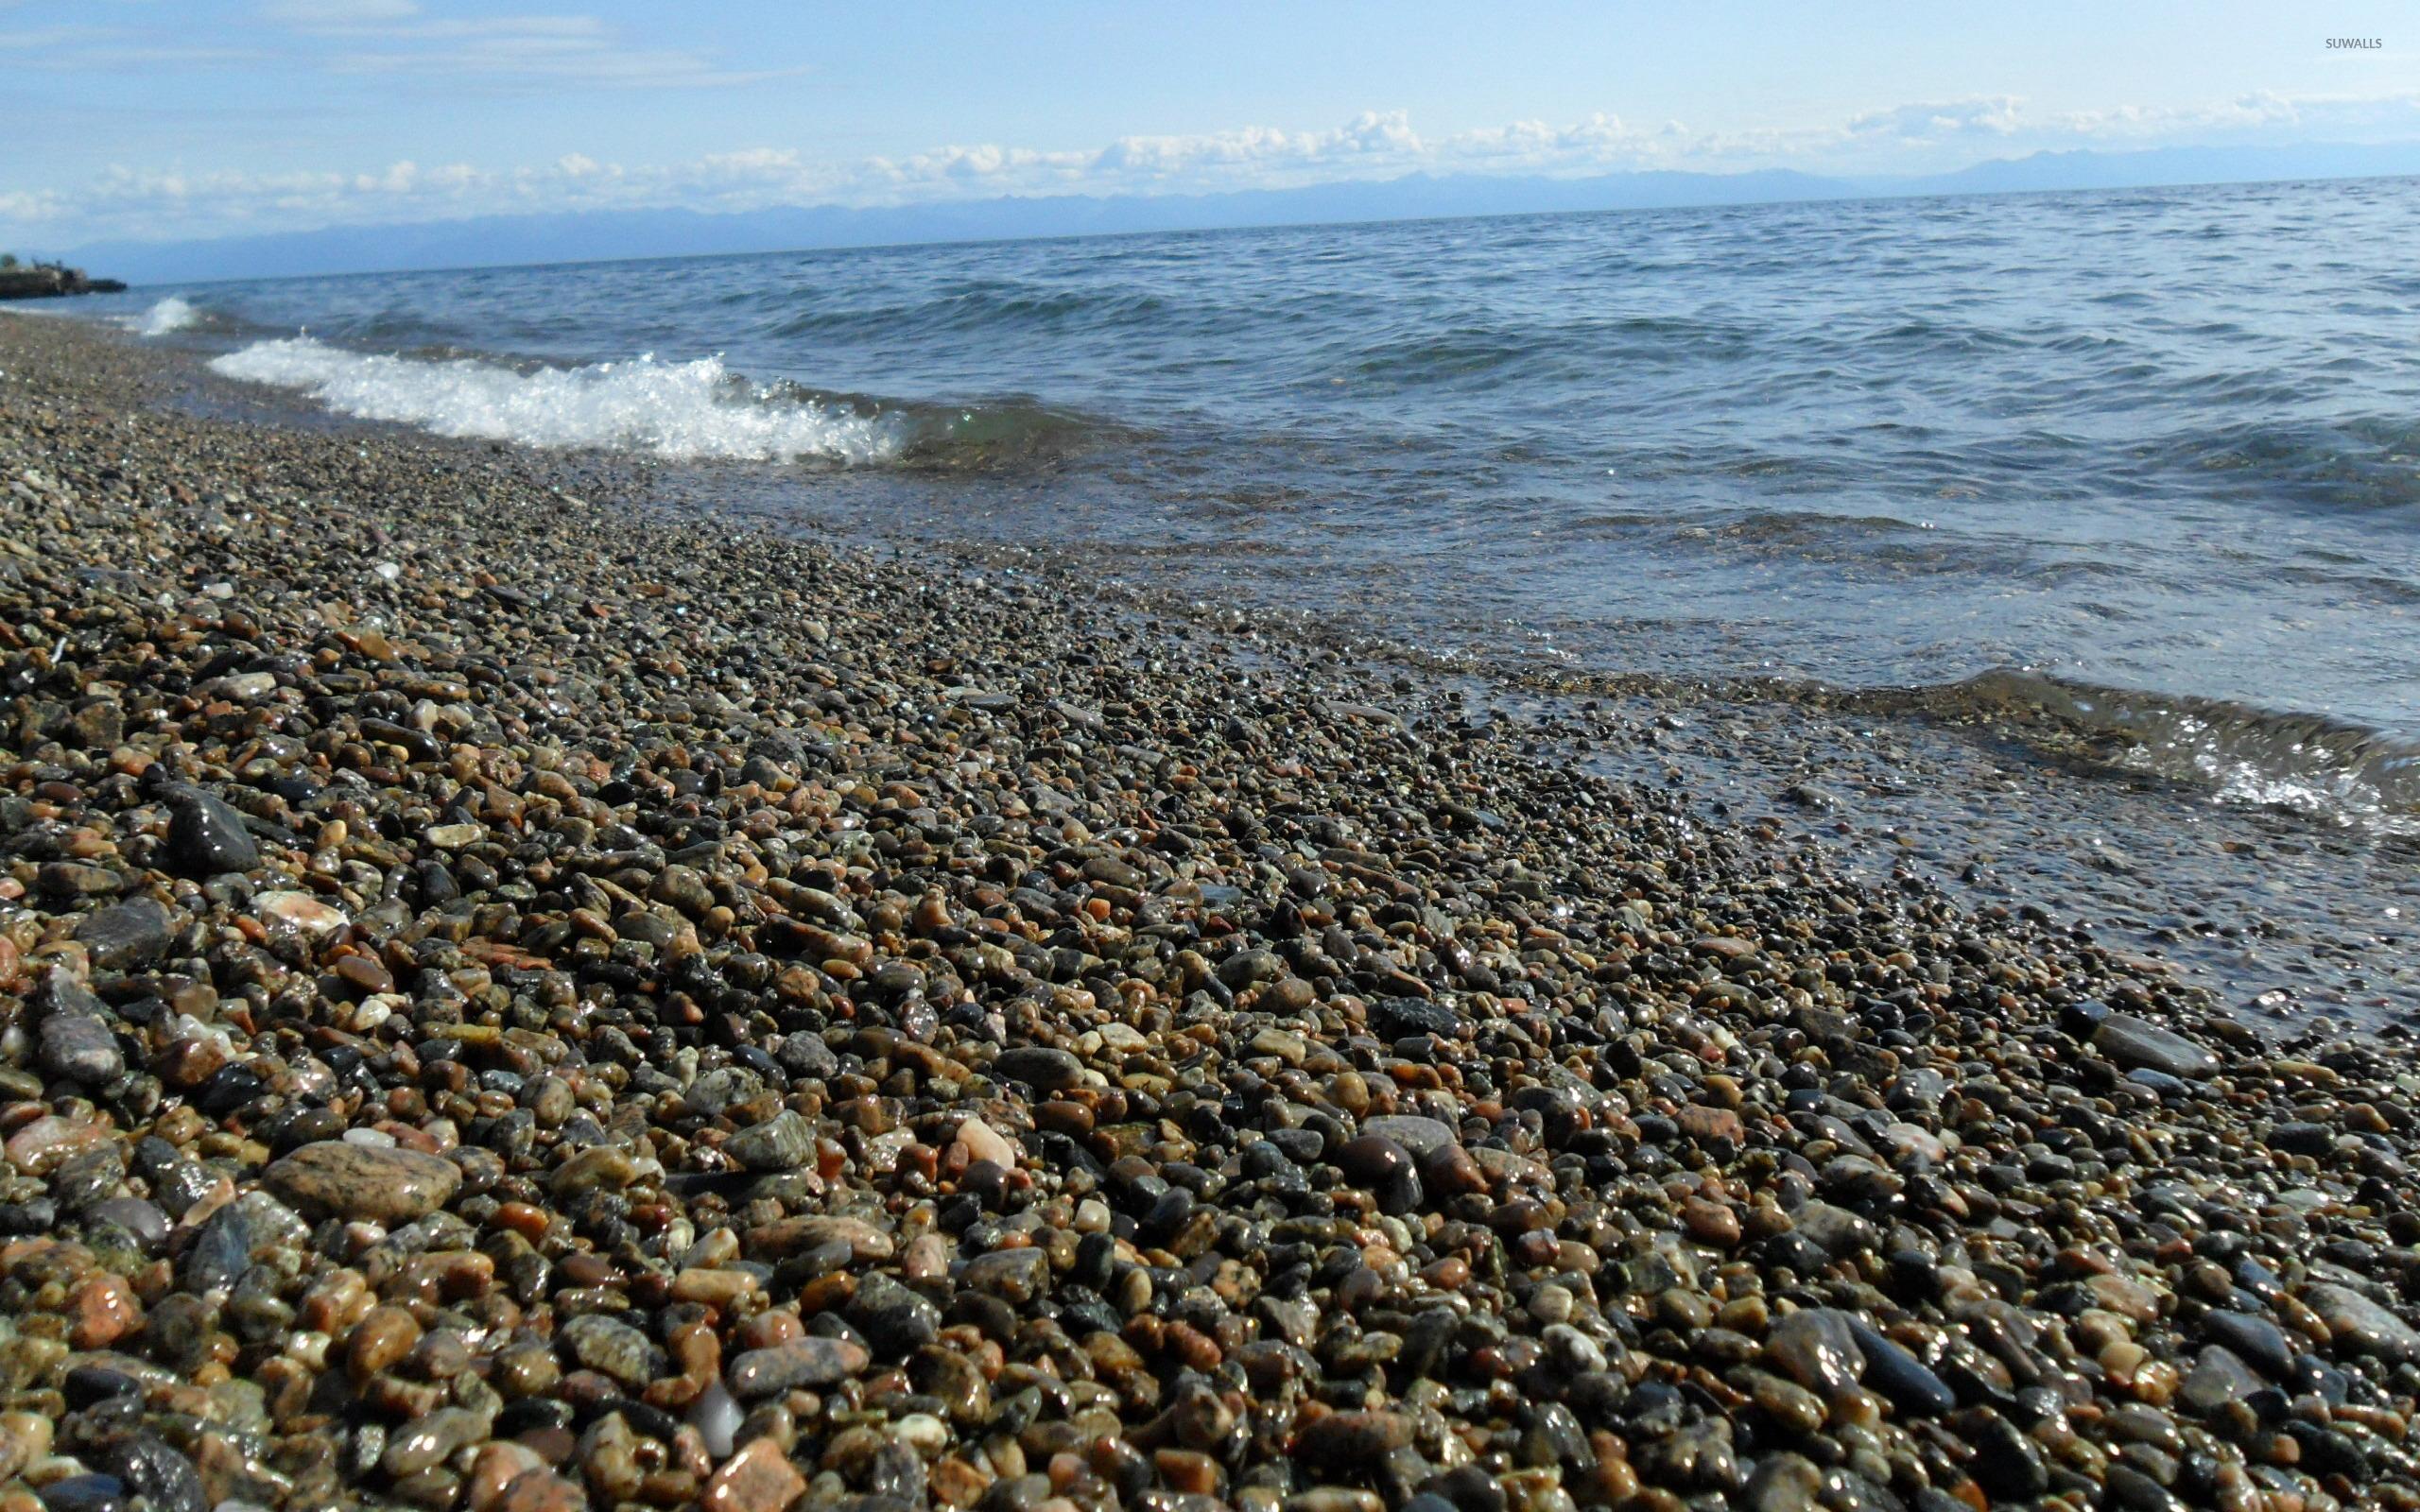 Pebble Beach At The Ocean 2 Wallpaper